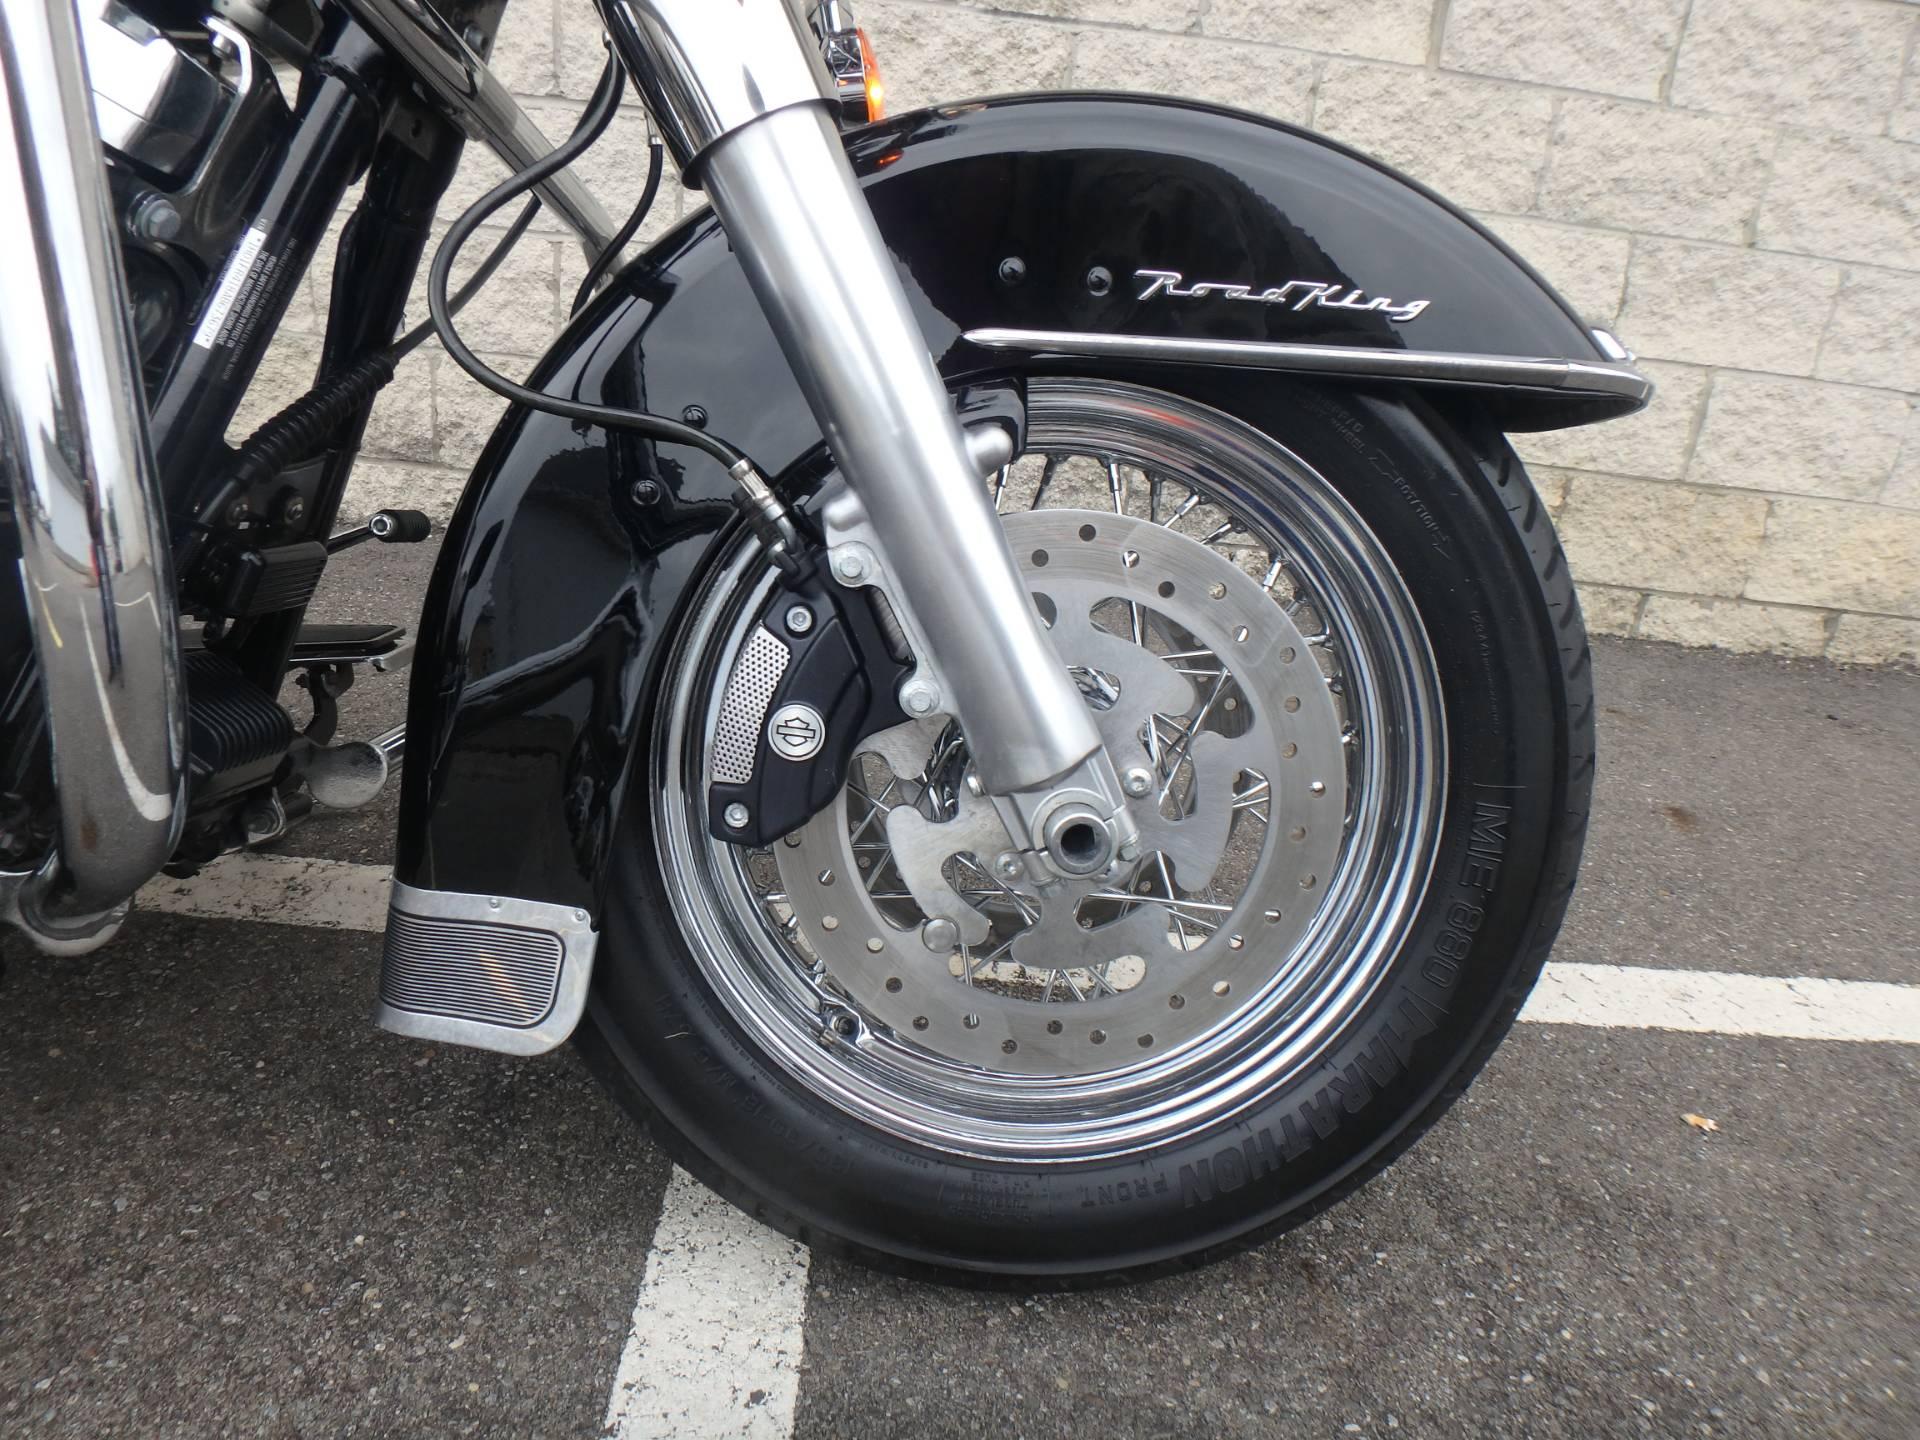 2010 Harley-Davidson Road King Classic 5